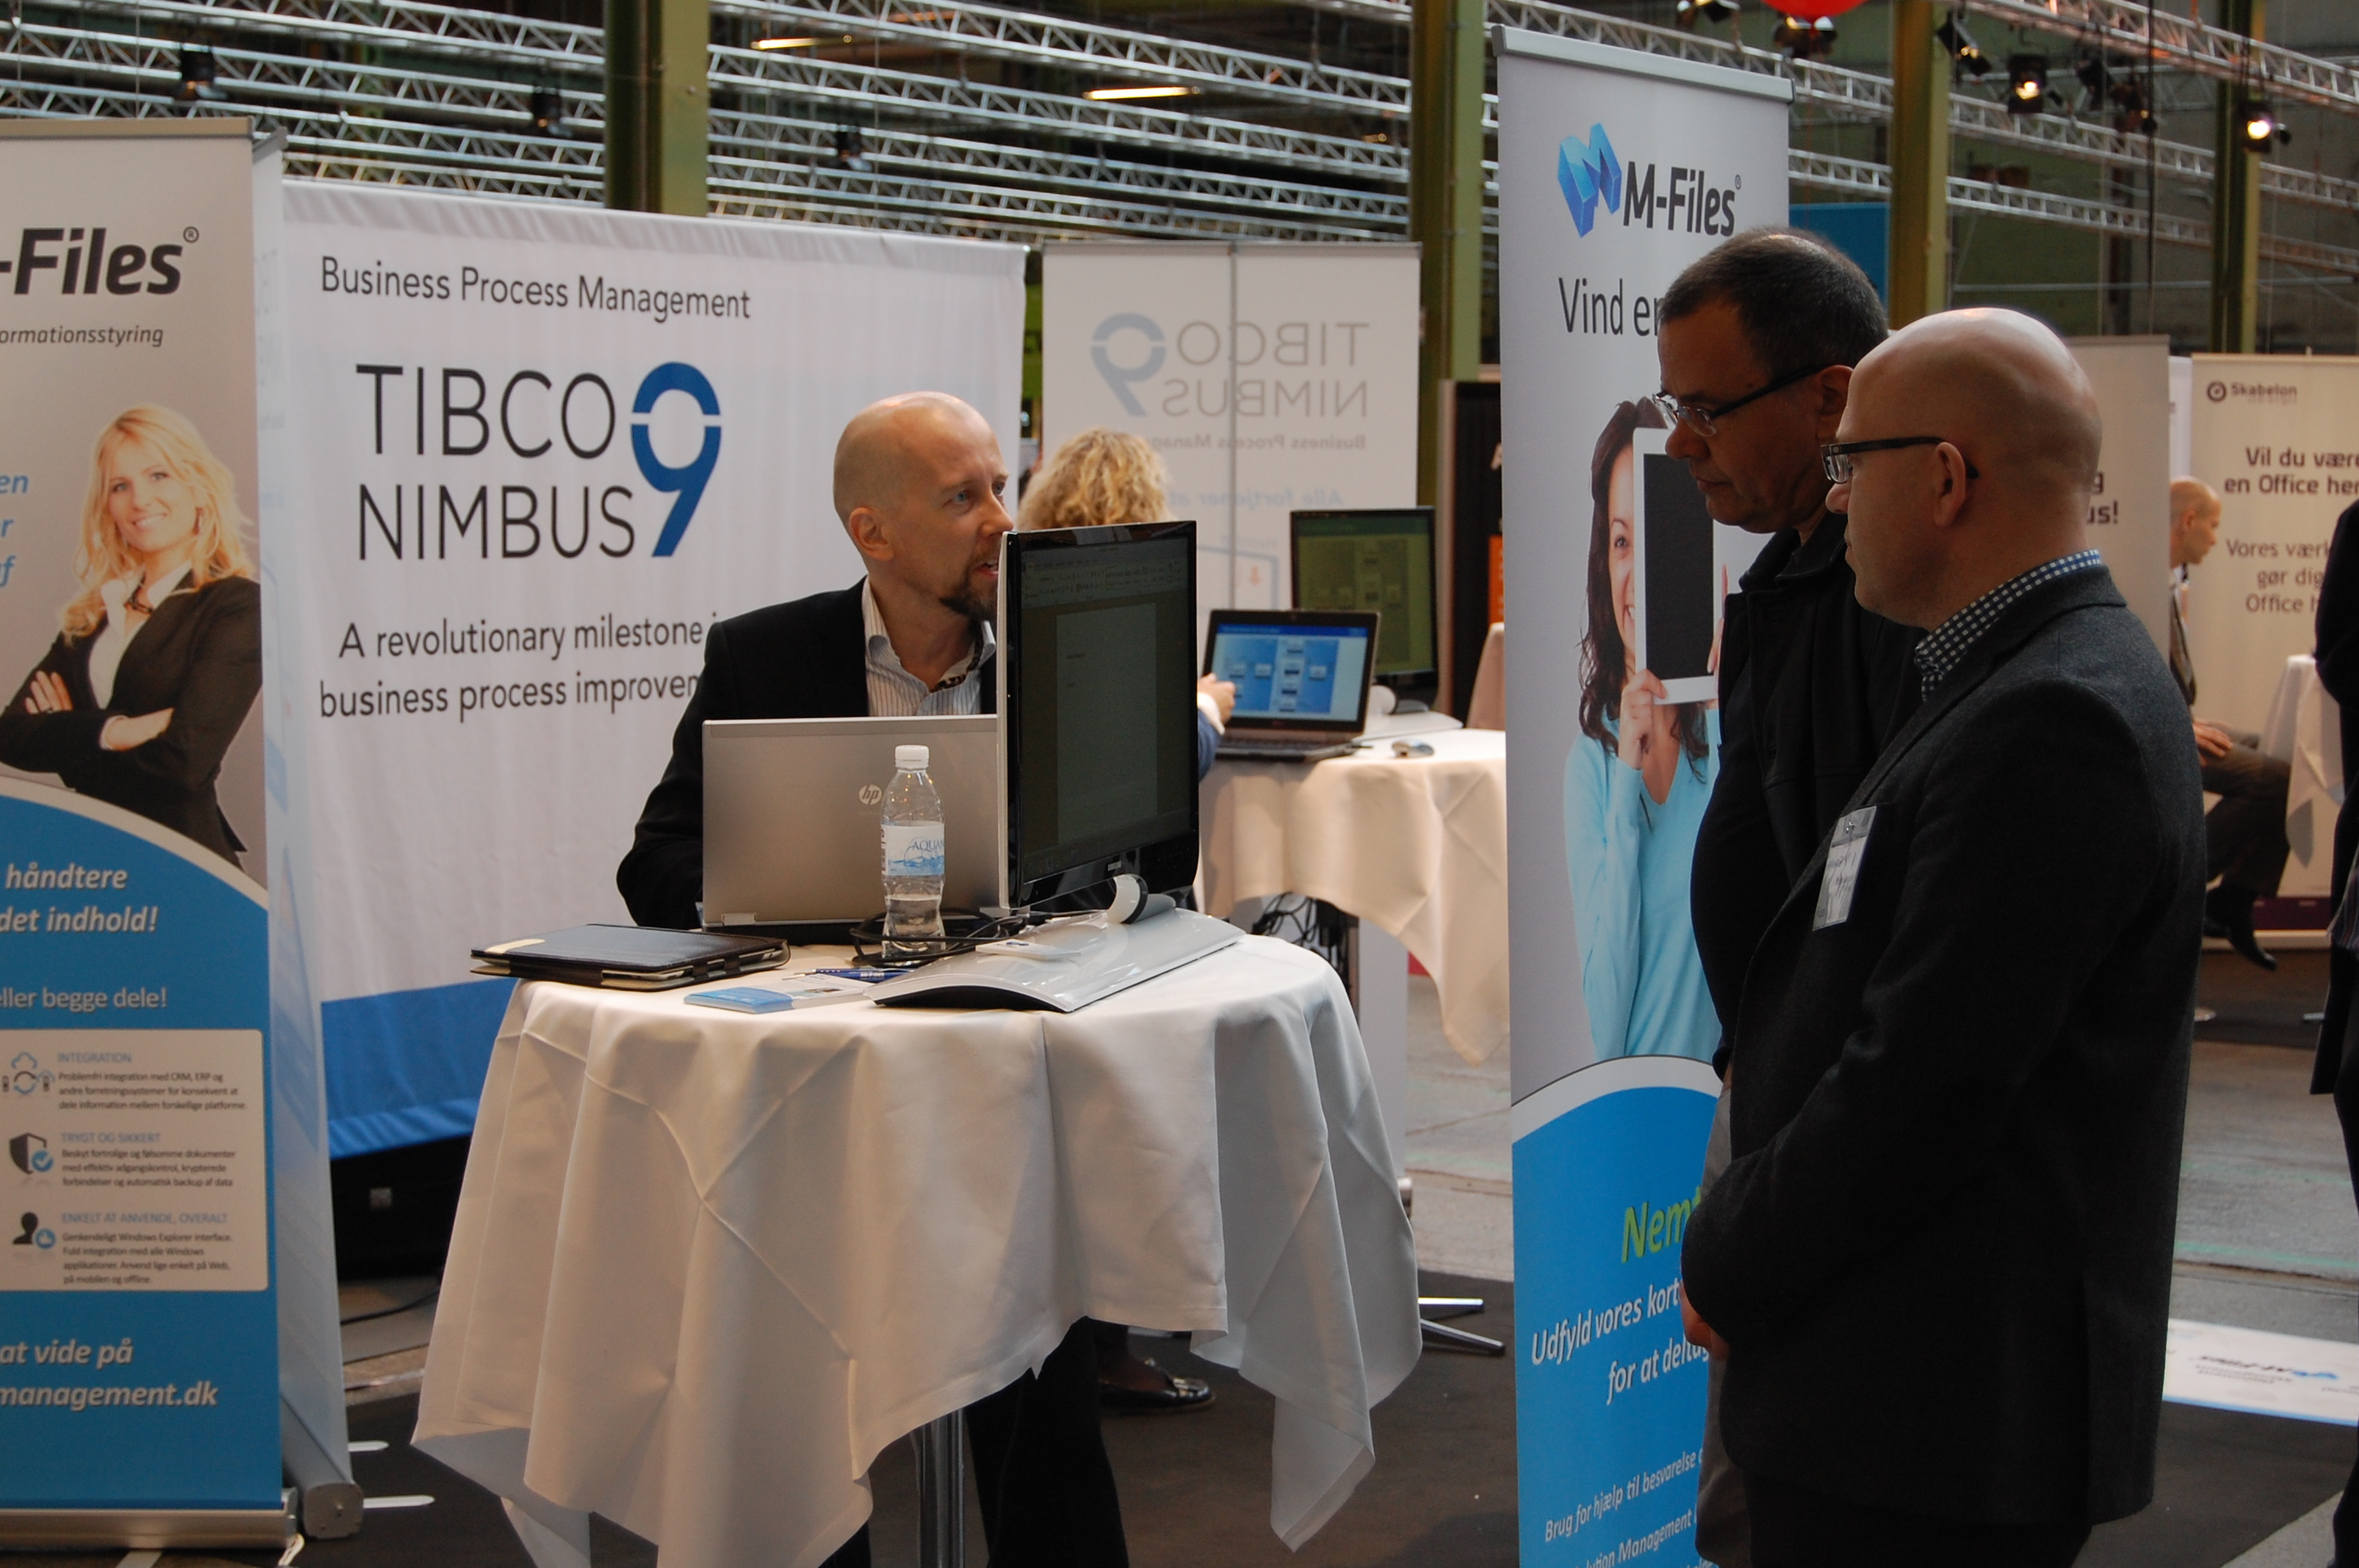 M-files and Tibco #cwe13